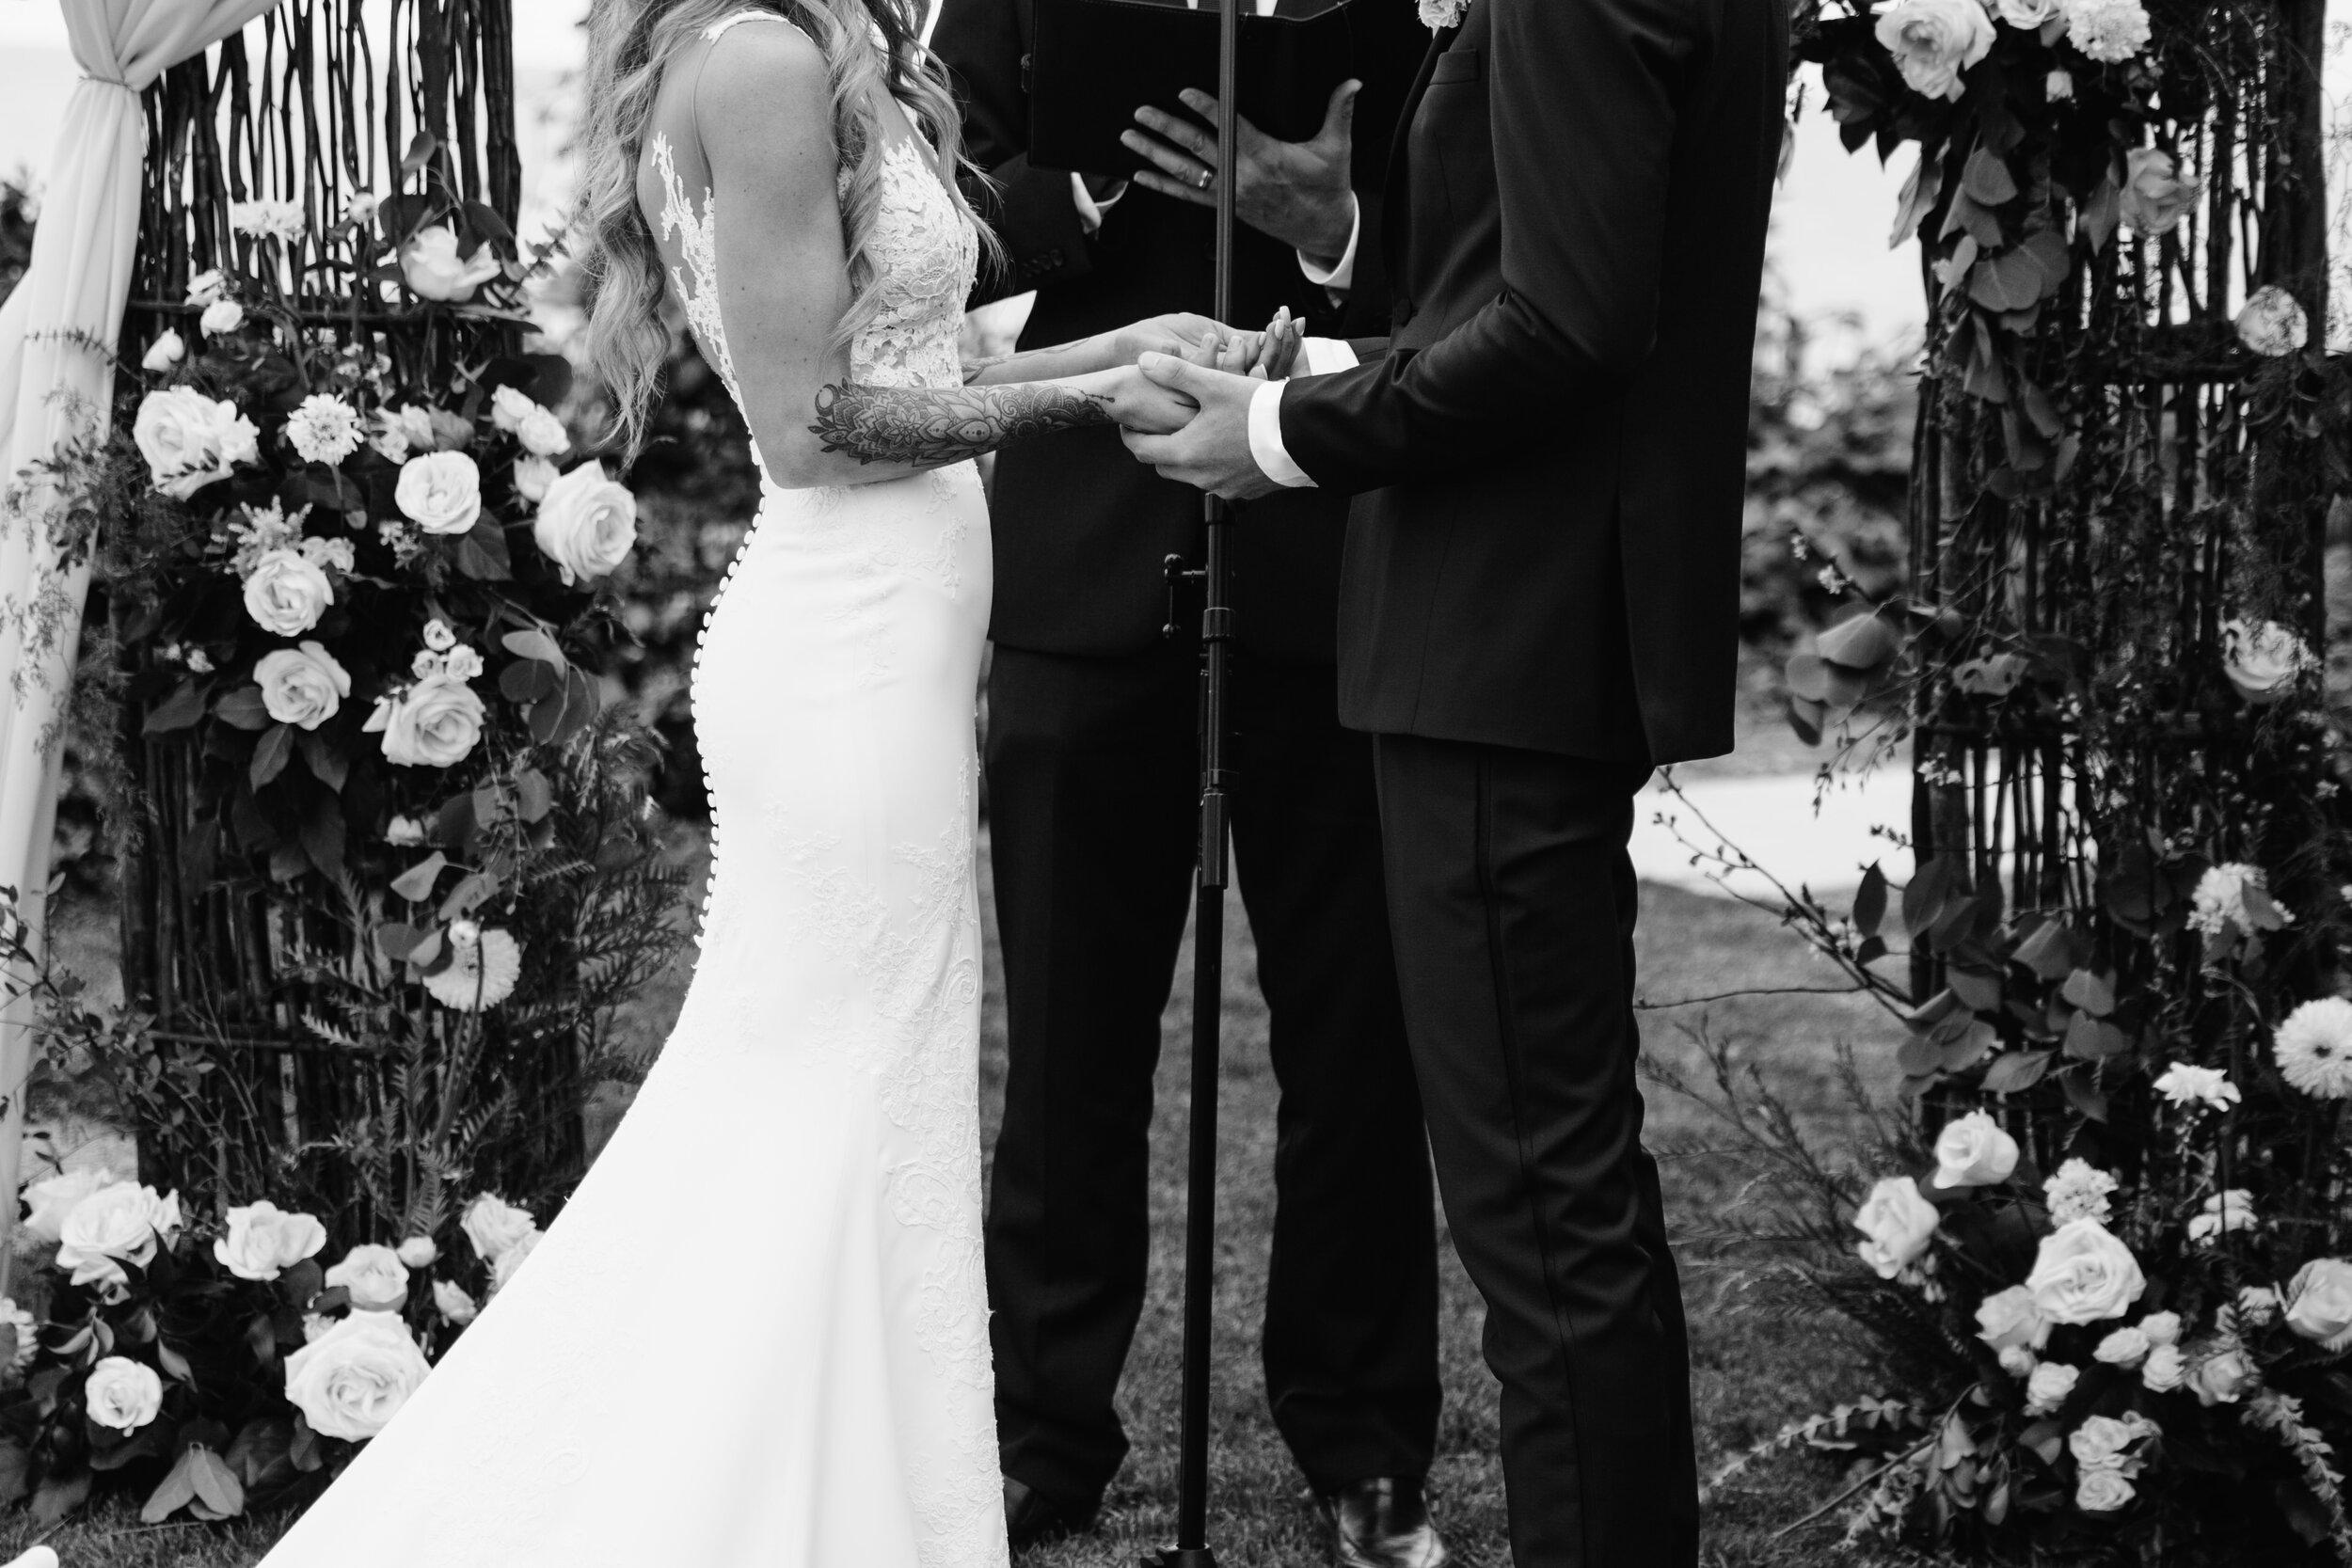 San Clemente wedding photographer, SoCal wedding photographer, Southern California wedding photographer, Orange County wedding photographer, OC wedding photographer, Ole Hanson wedding, Ole Hanson